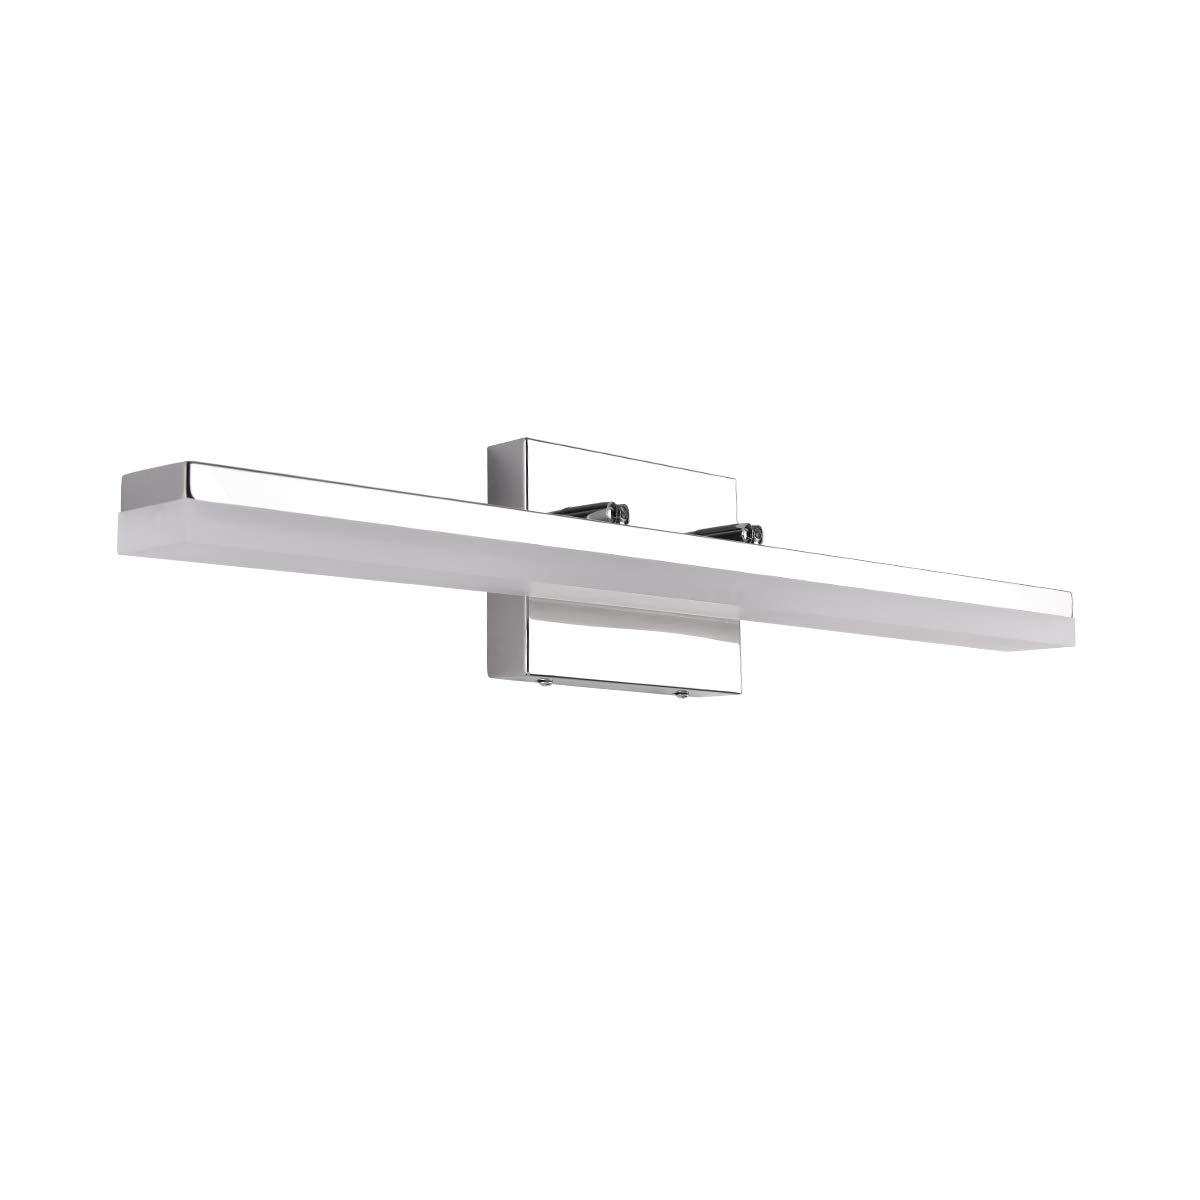 mirrea 24in Modern LED Vanity Light for Bathroom Lighting dimmable 24w Cold White